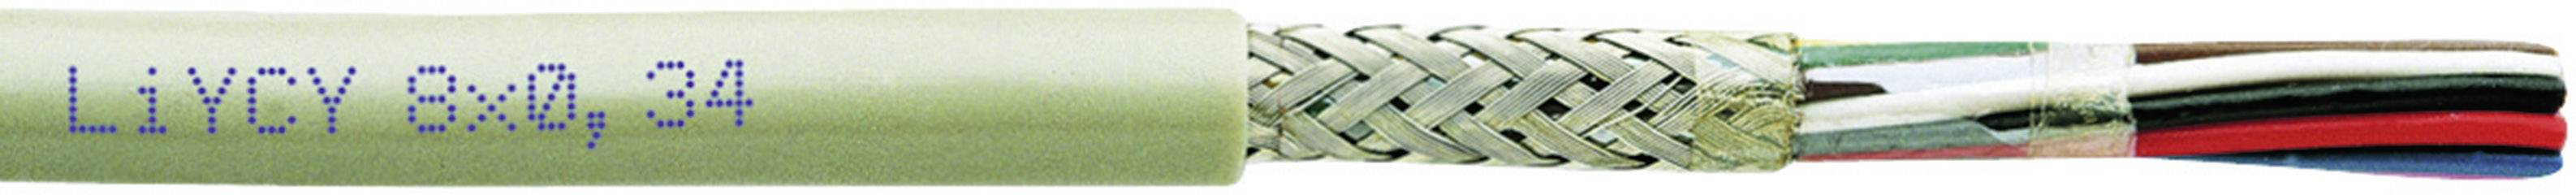 Lapp Kabel ÖLFLEX CLASSIC 110 25x1,5mm² Steuerleitung 1119325 Meterware